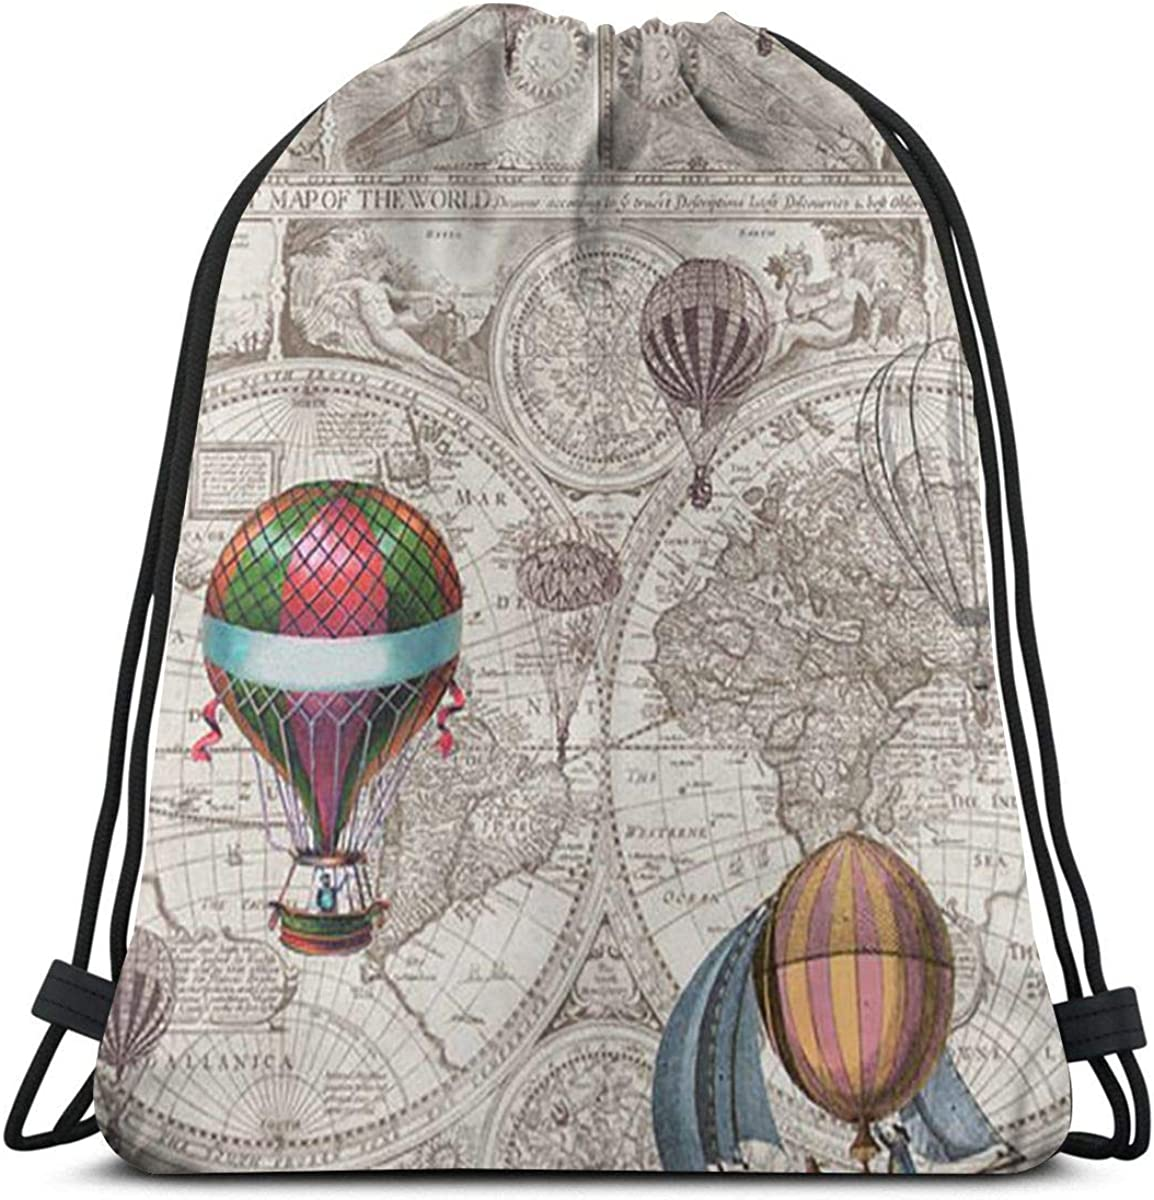 Bags Steampunk Map Printing Water Resistant Sports Gymsack Drawstring Bag